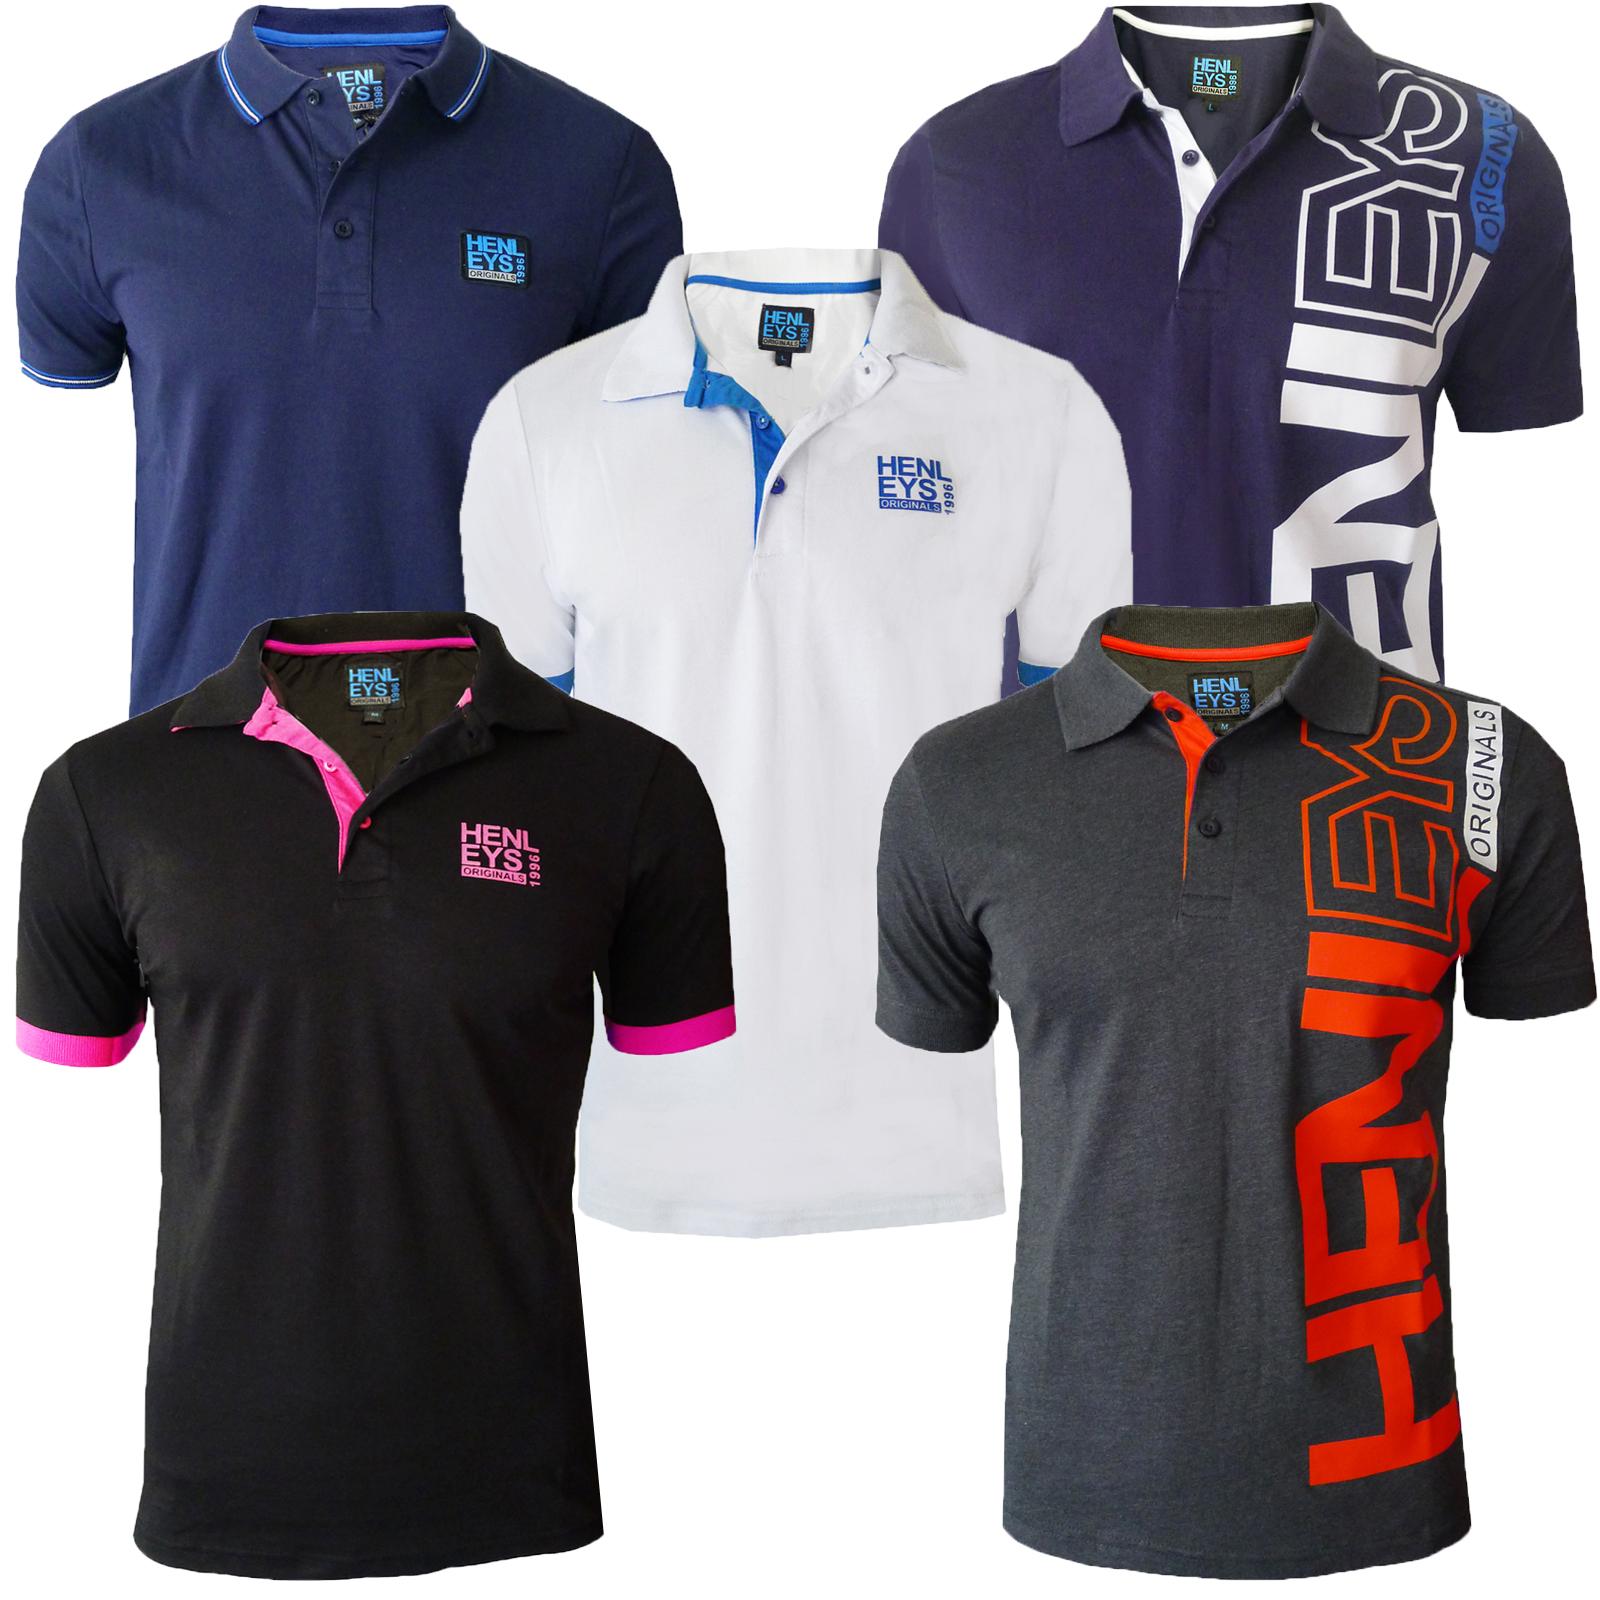 Shirt design gents - Henleys Designer Mens Polo Shirt Casual Collared Pique Top Short Sleeved T Shirt